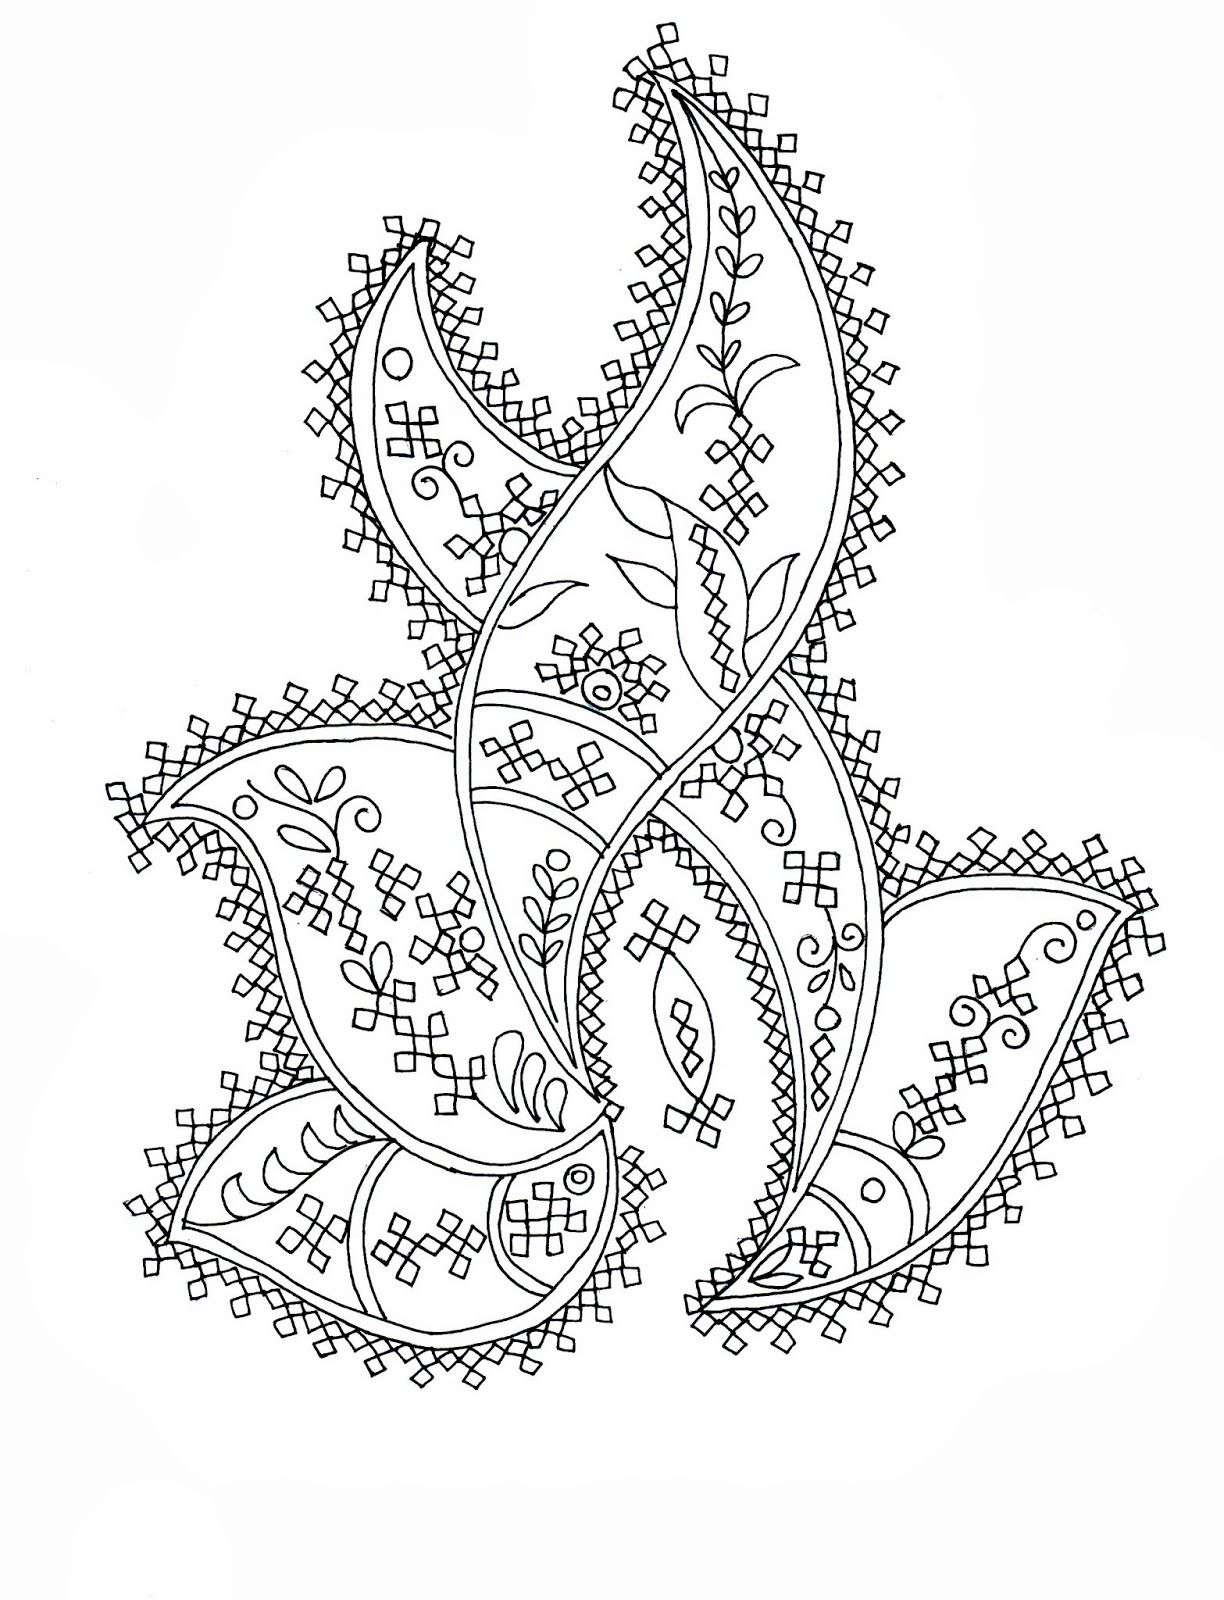 Pattern embroidery patterns pinterest patterns embroidery pattern bankloansurffo Gallery